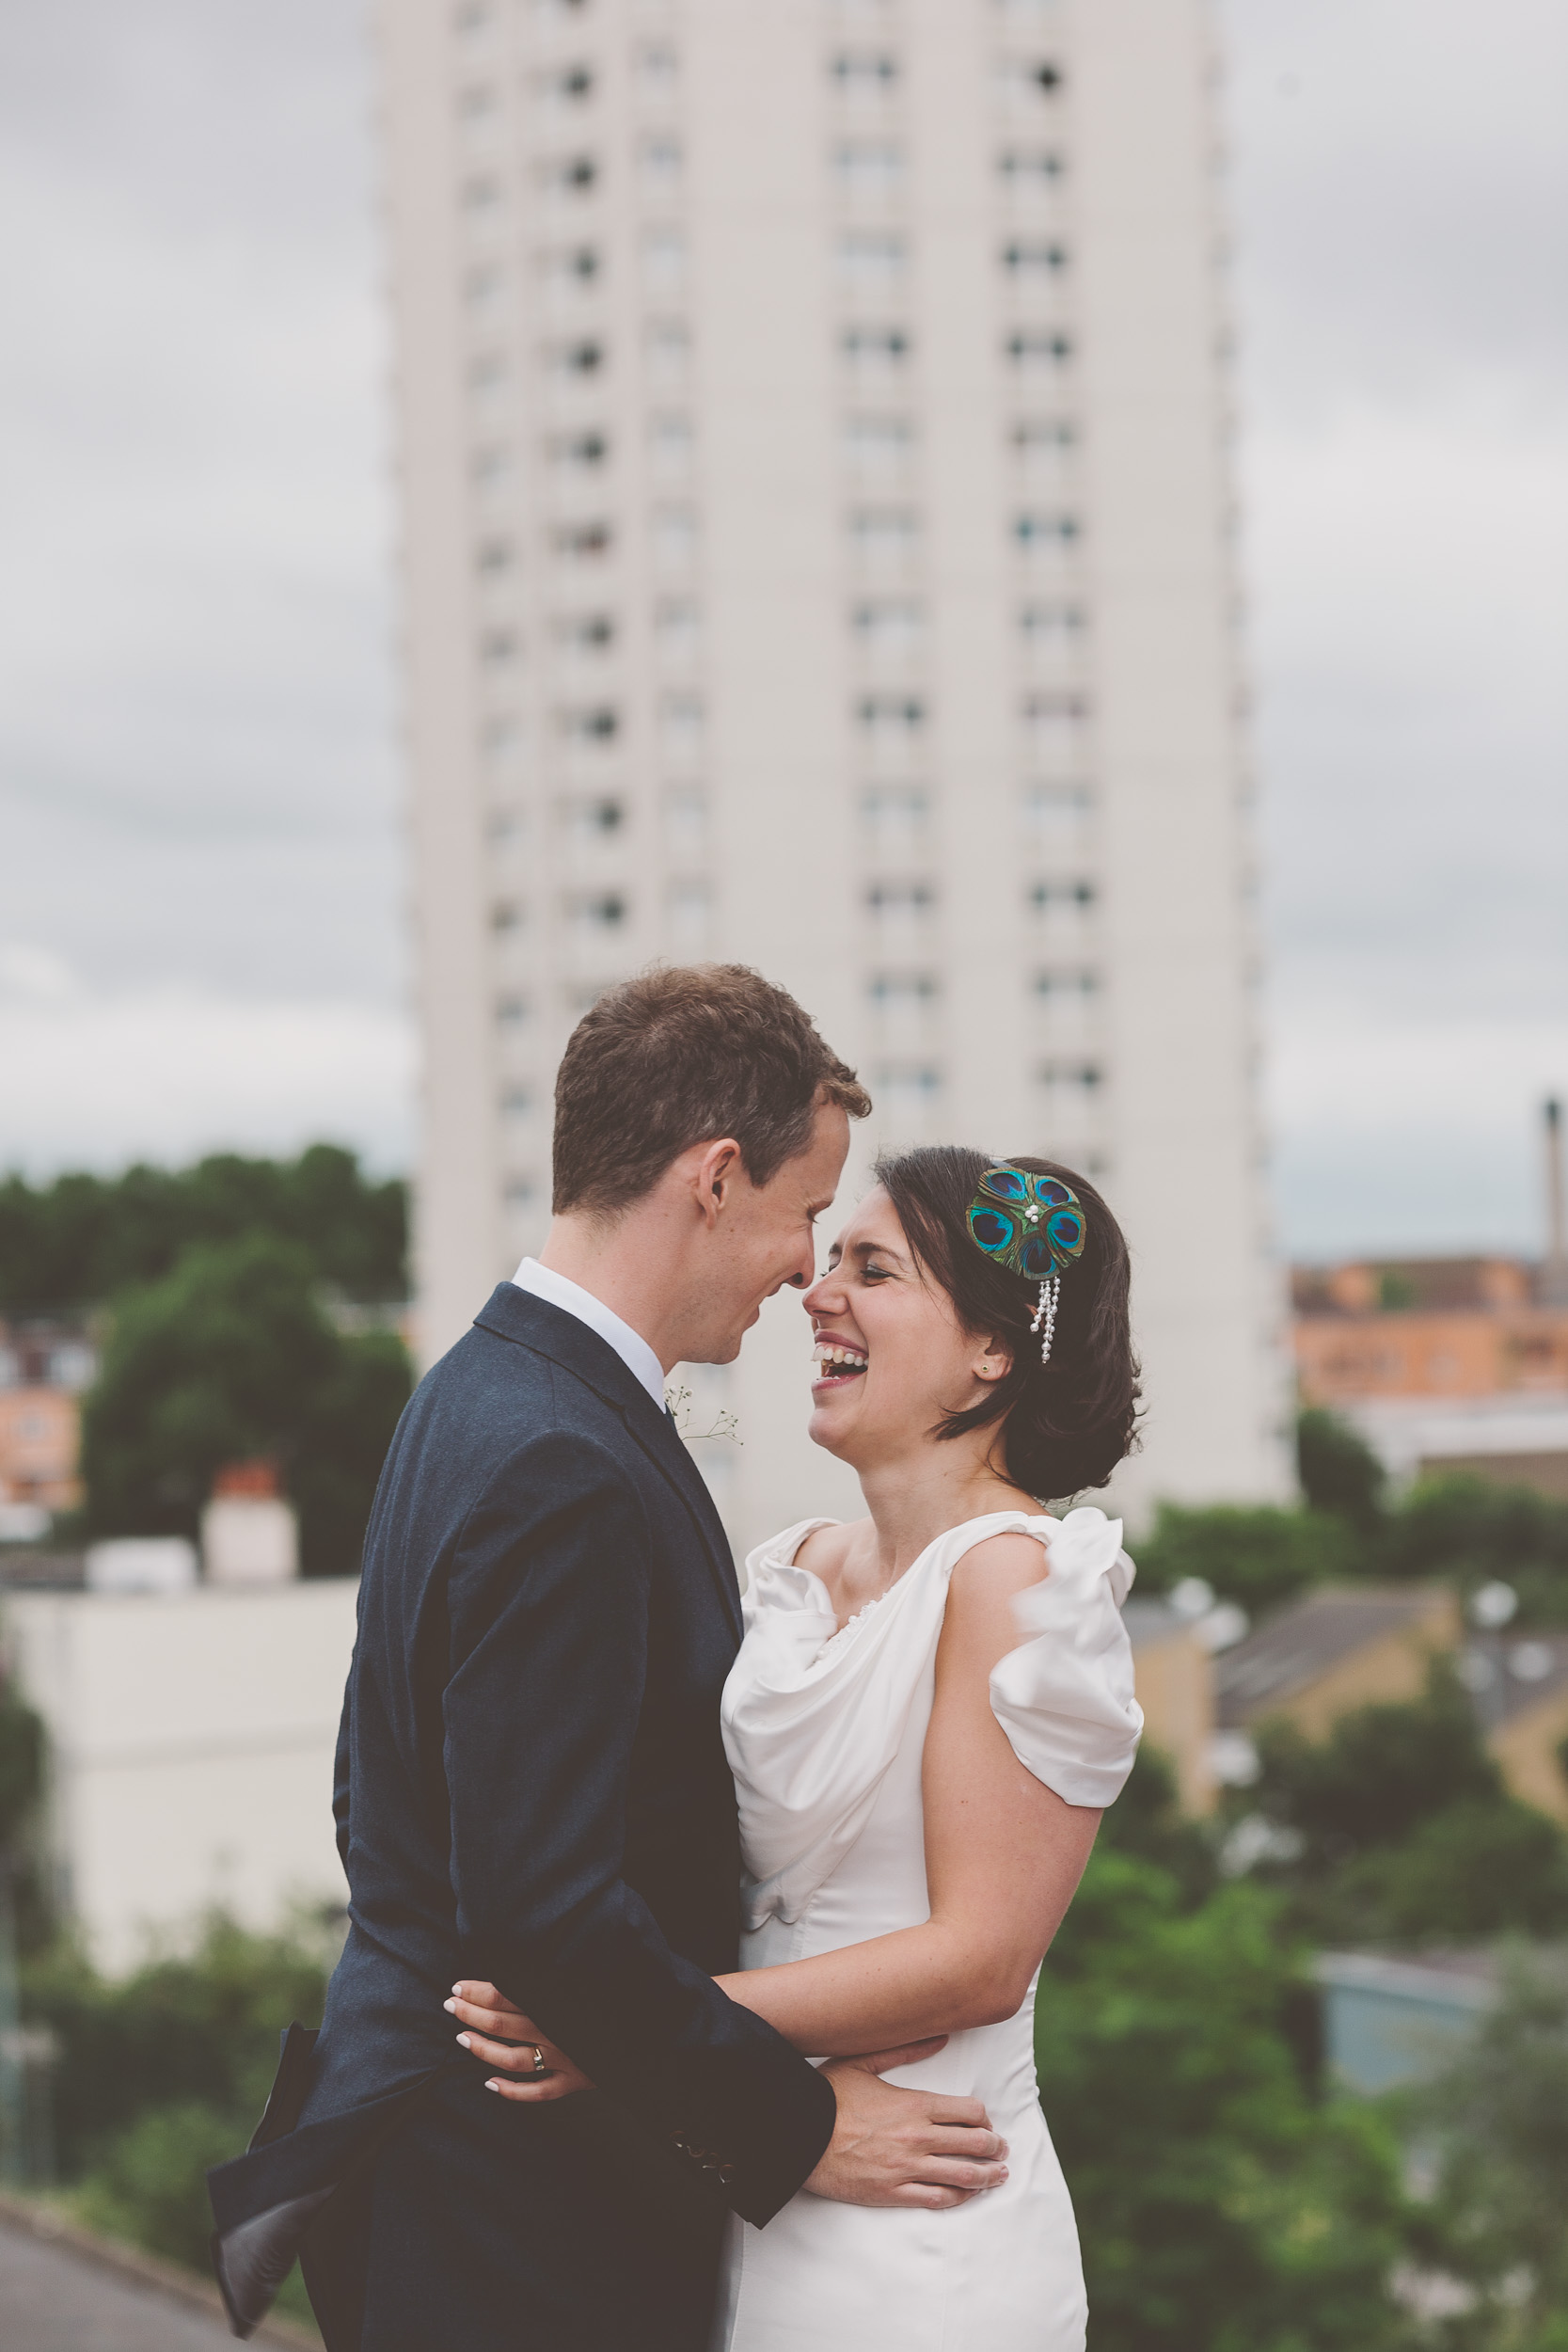 islington-town-hall-4th-floor-studios-wedding284.jpg